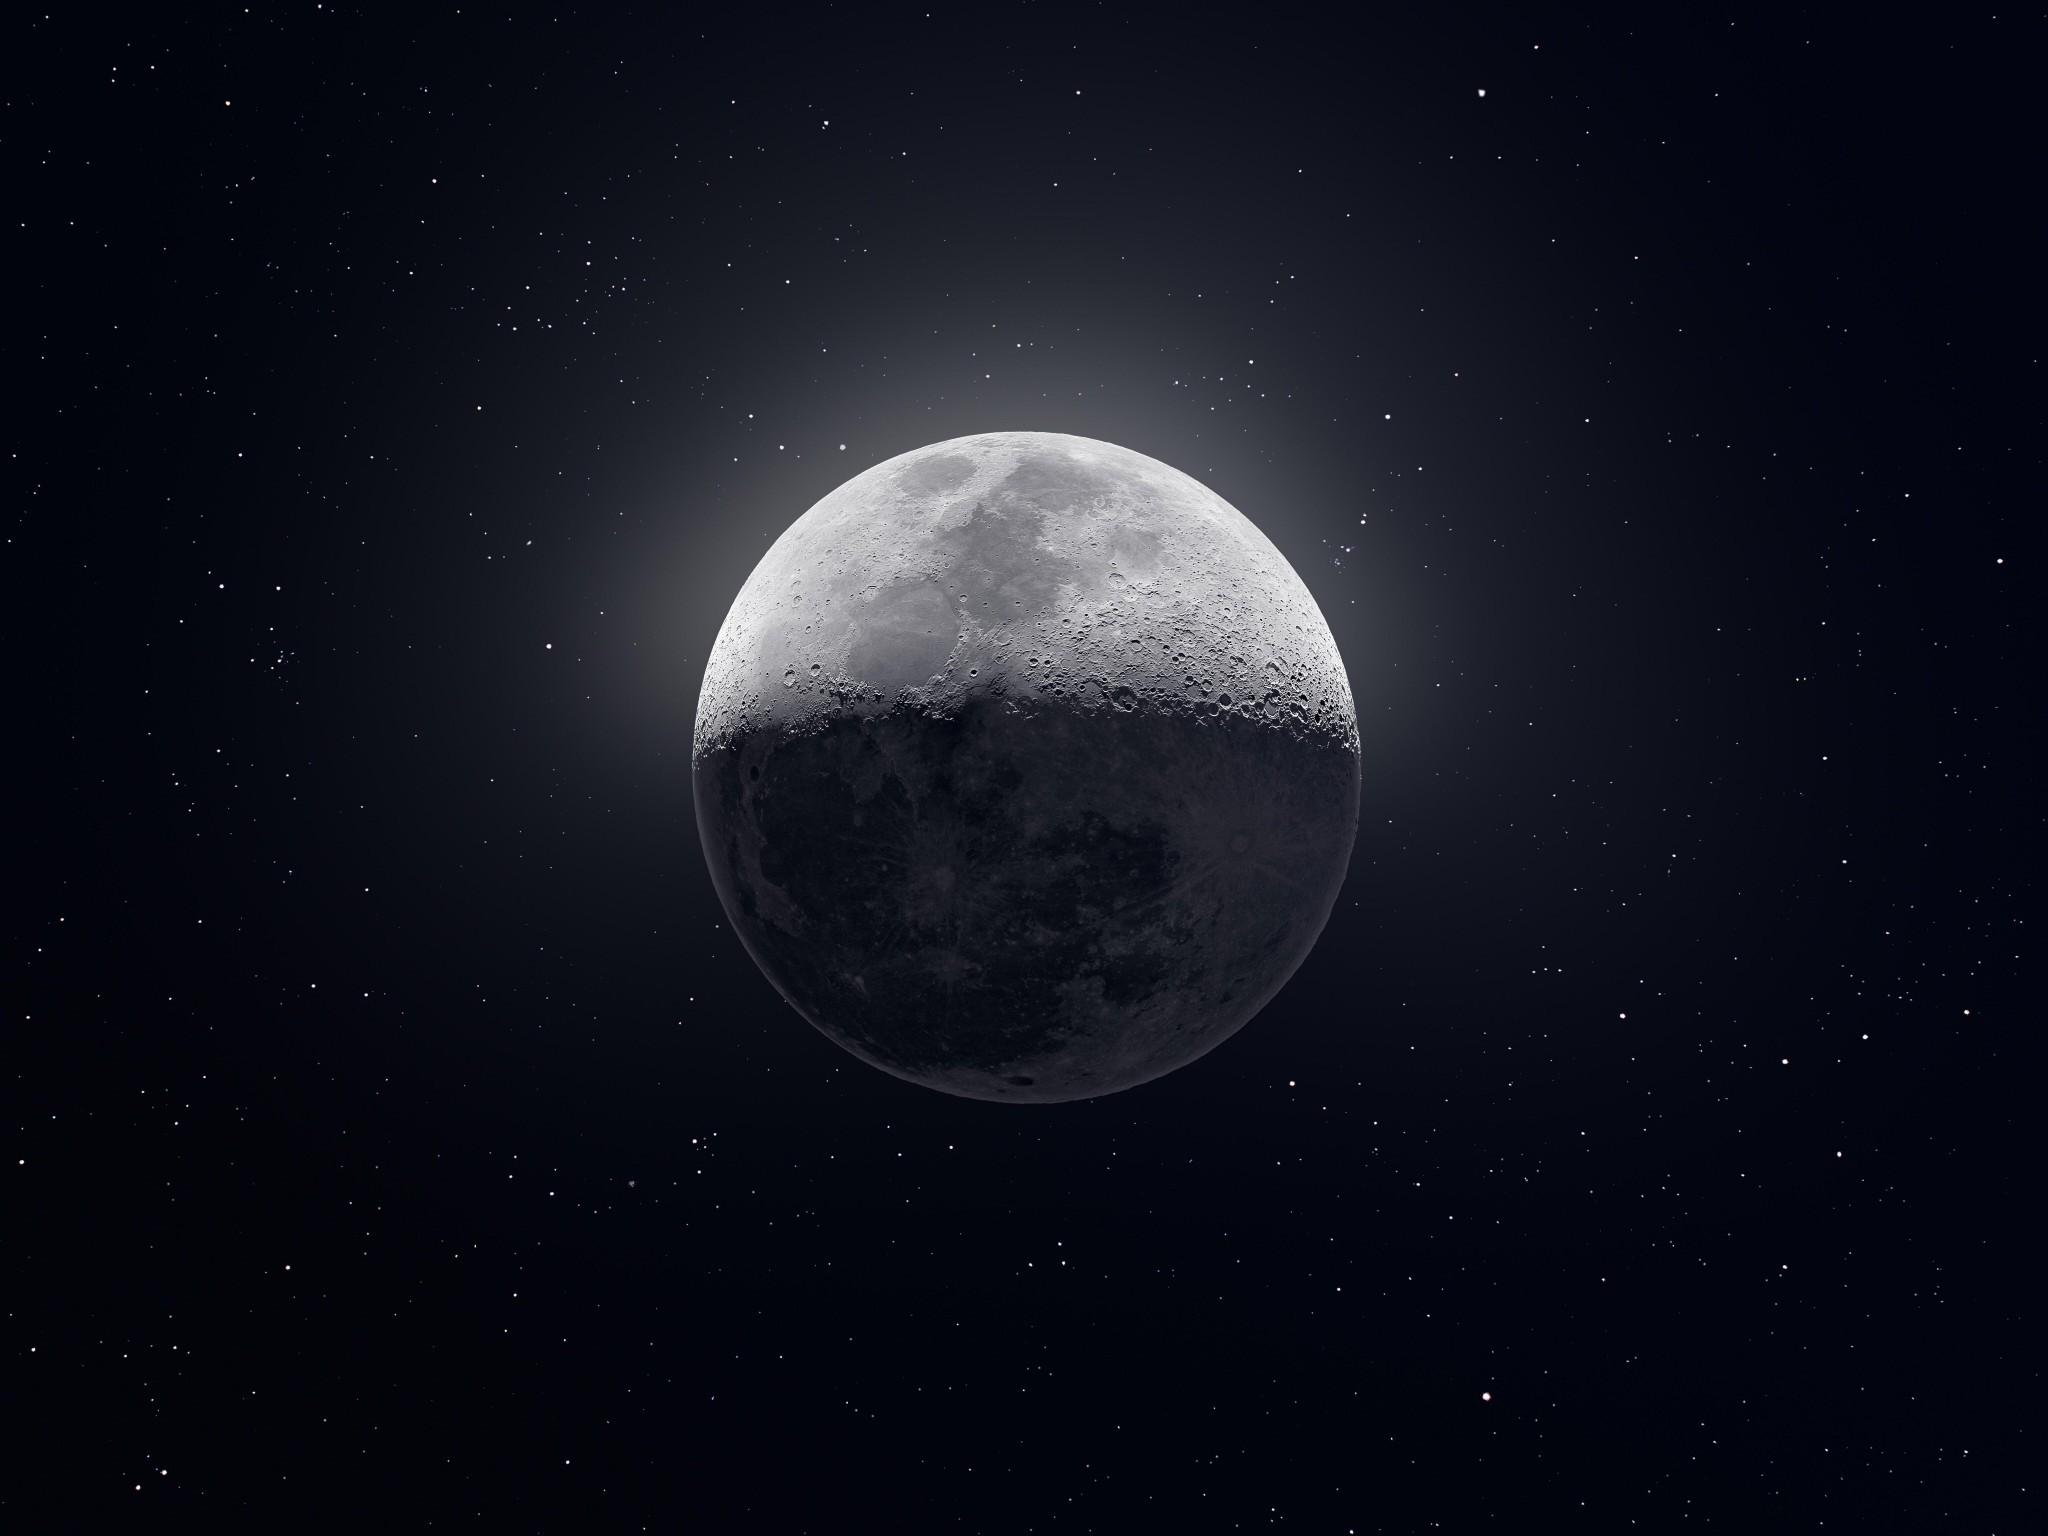 134 1347258 moon black and white stars